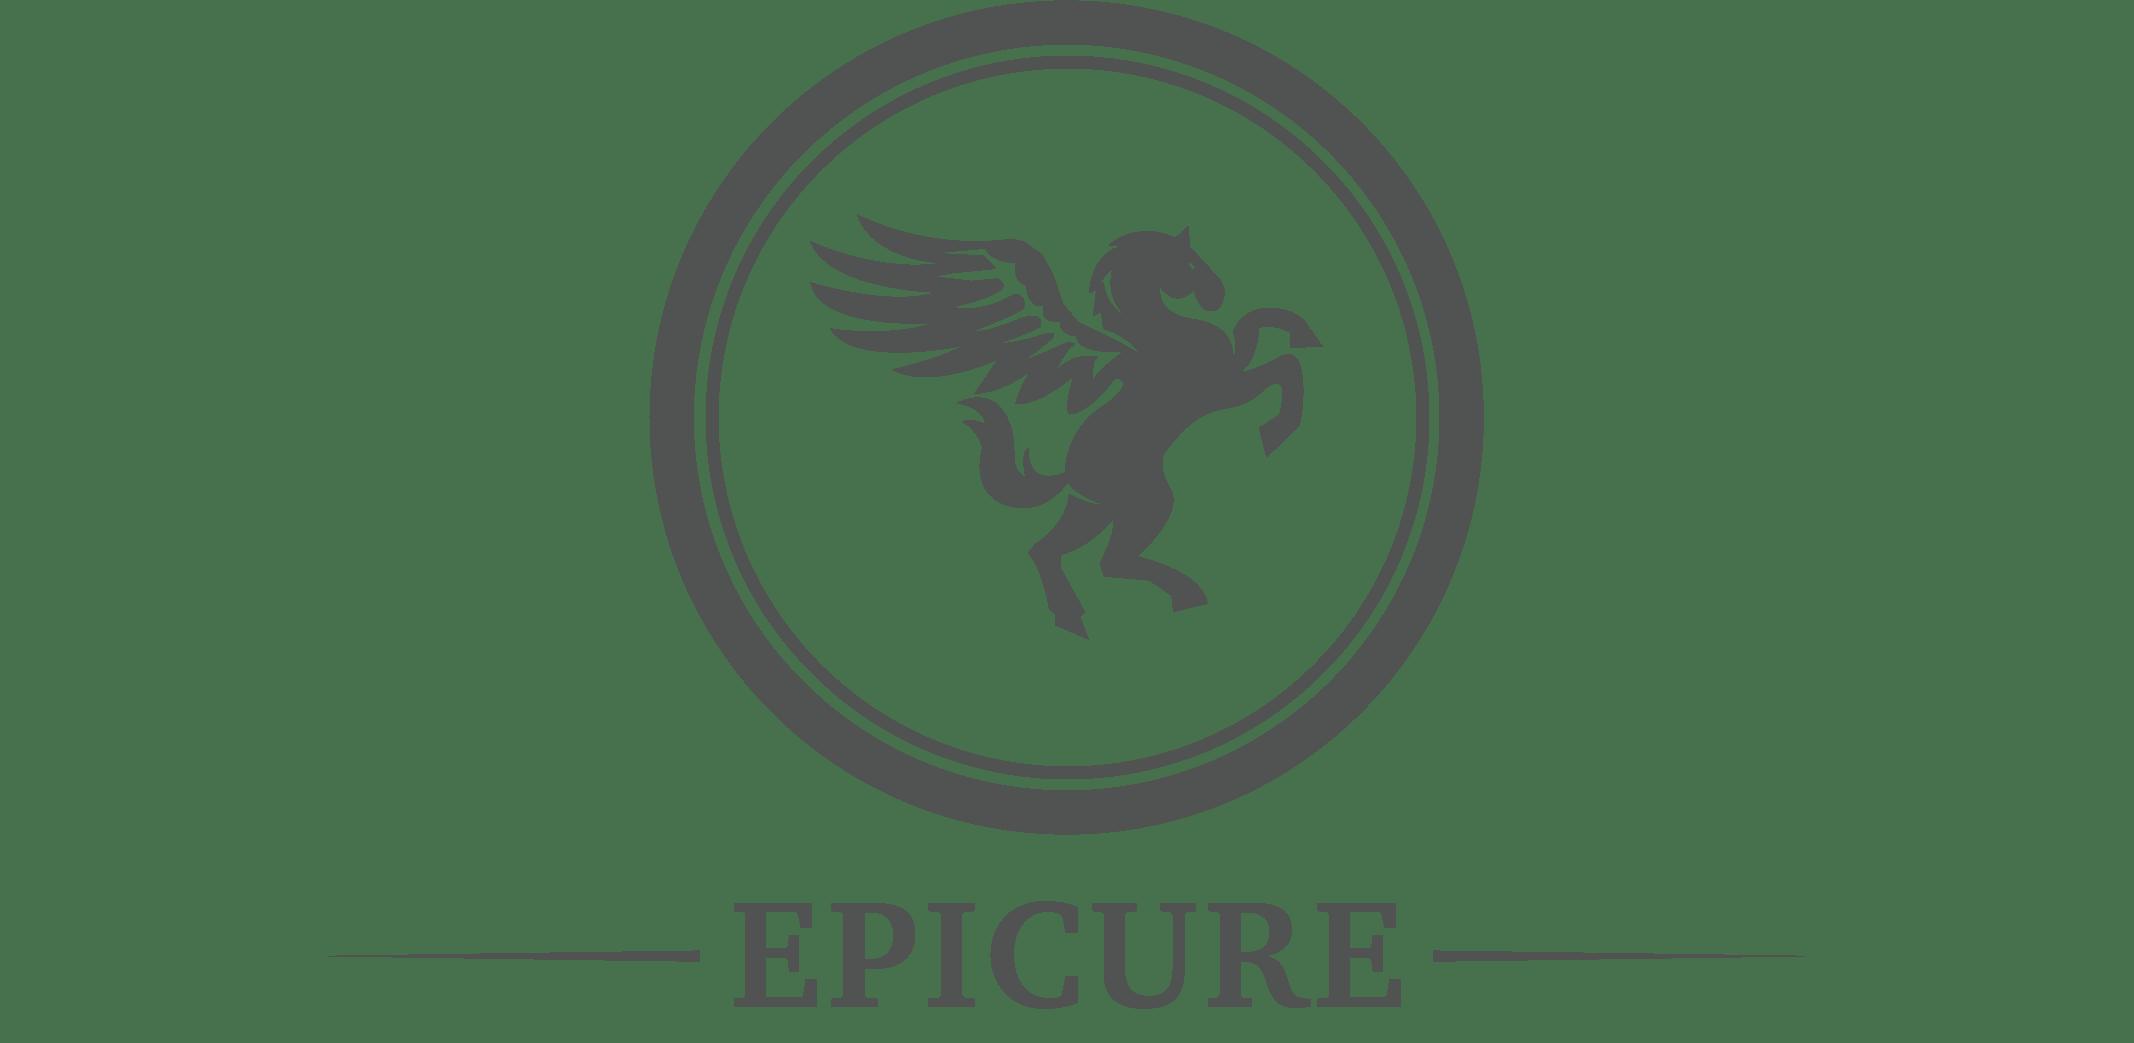 Epicure brand logo